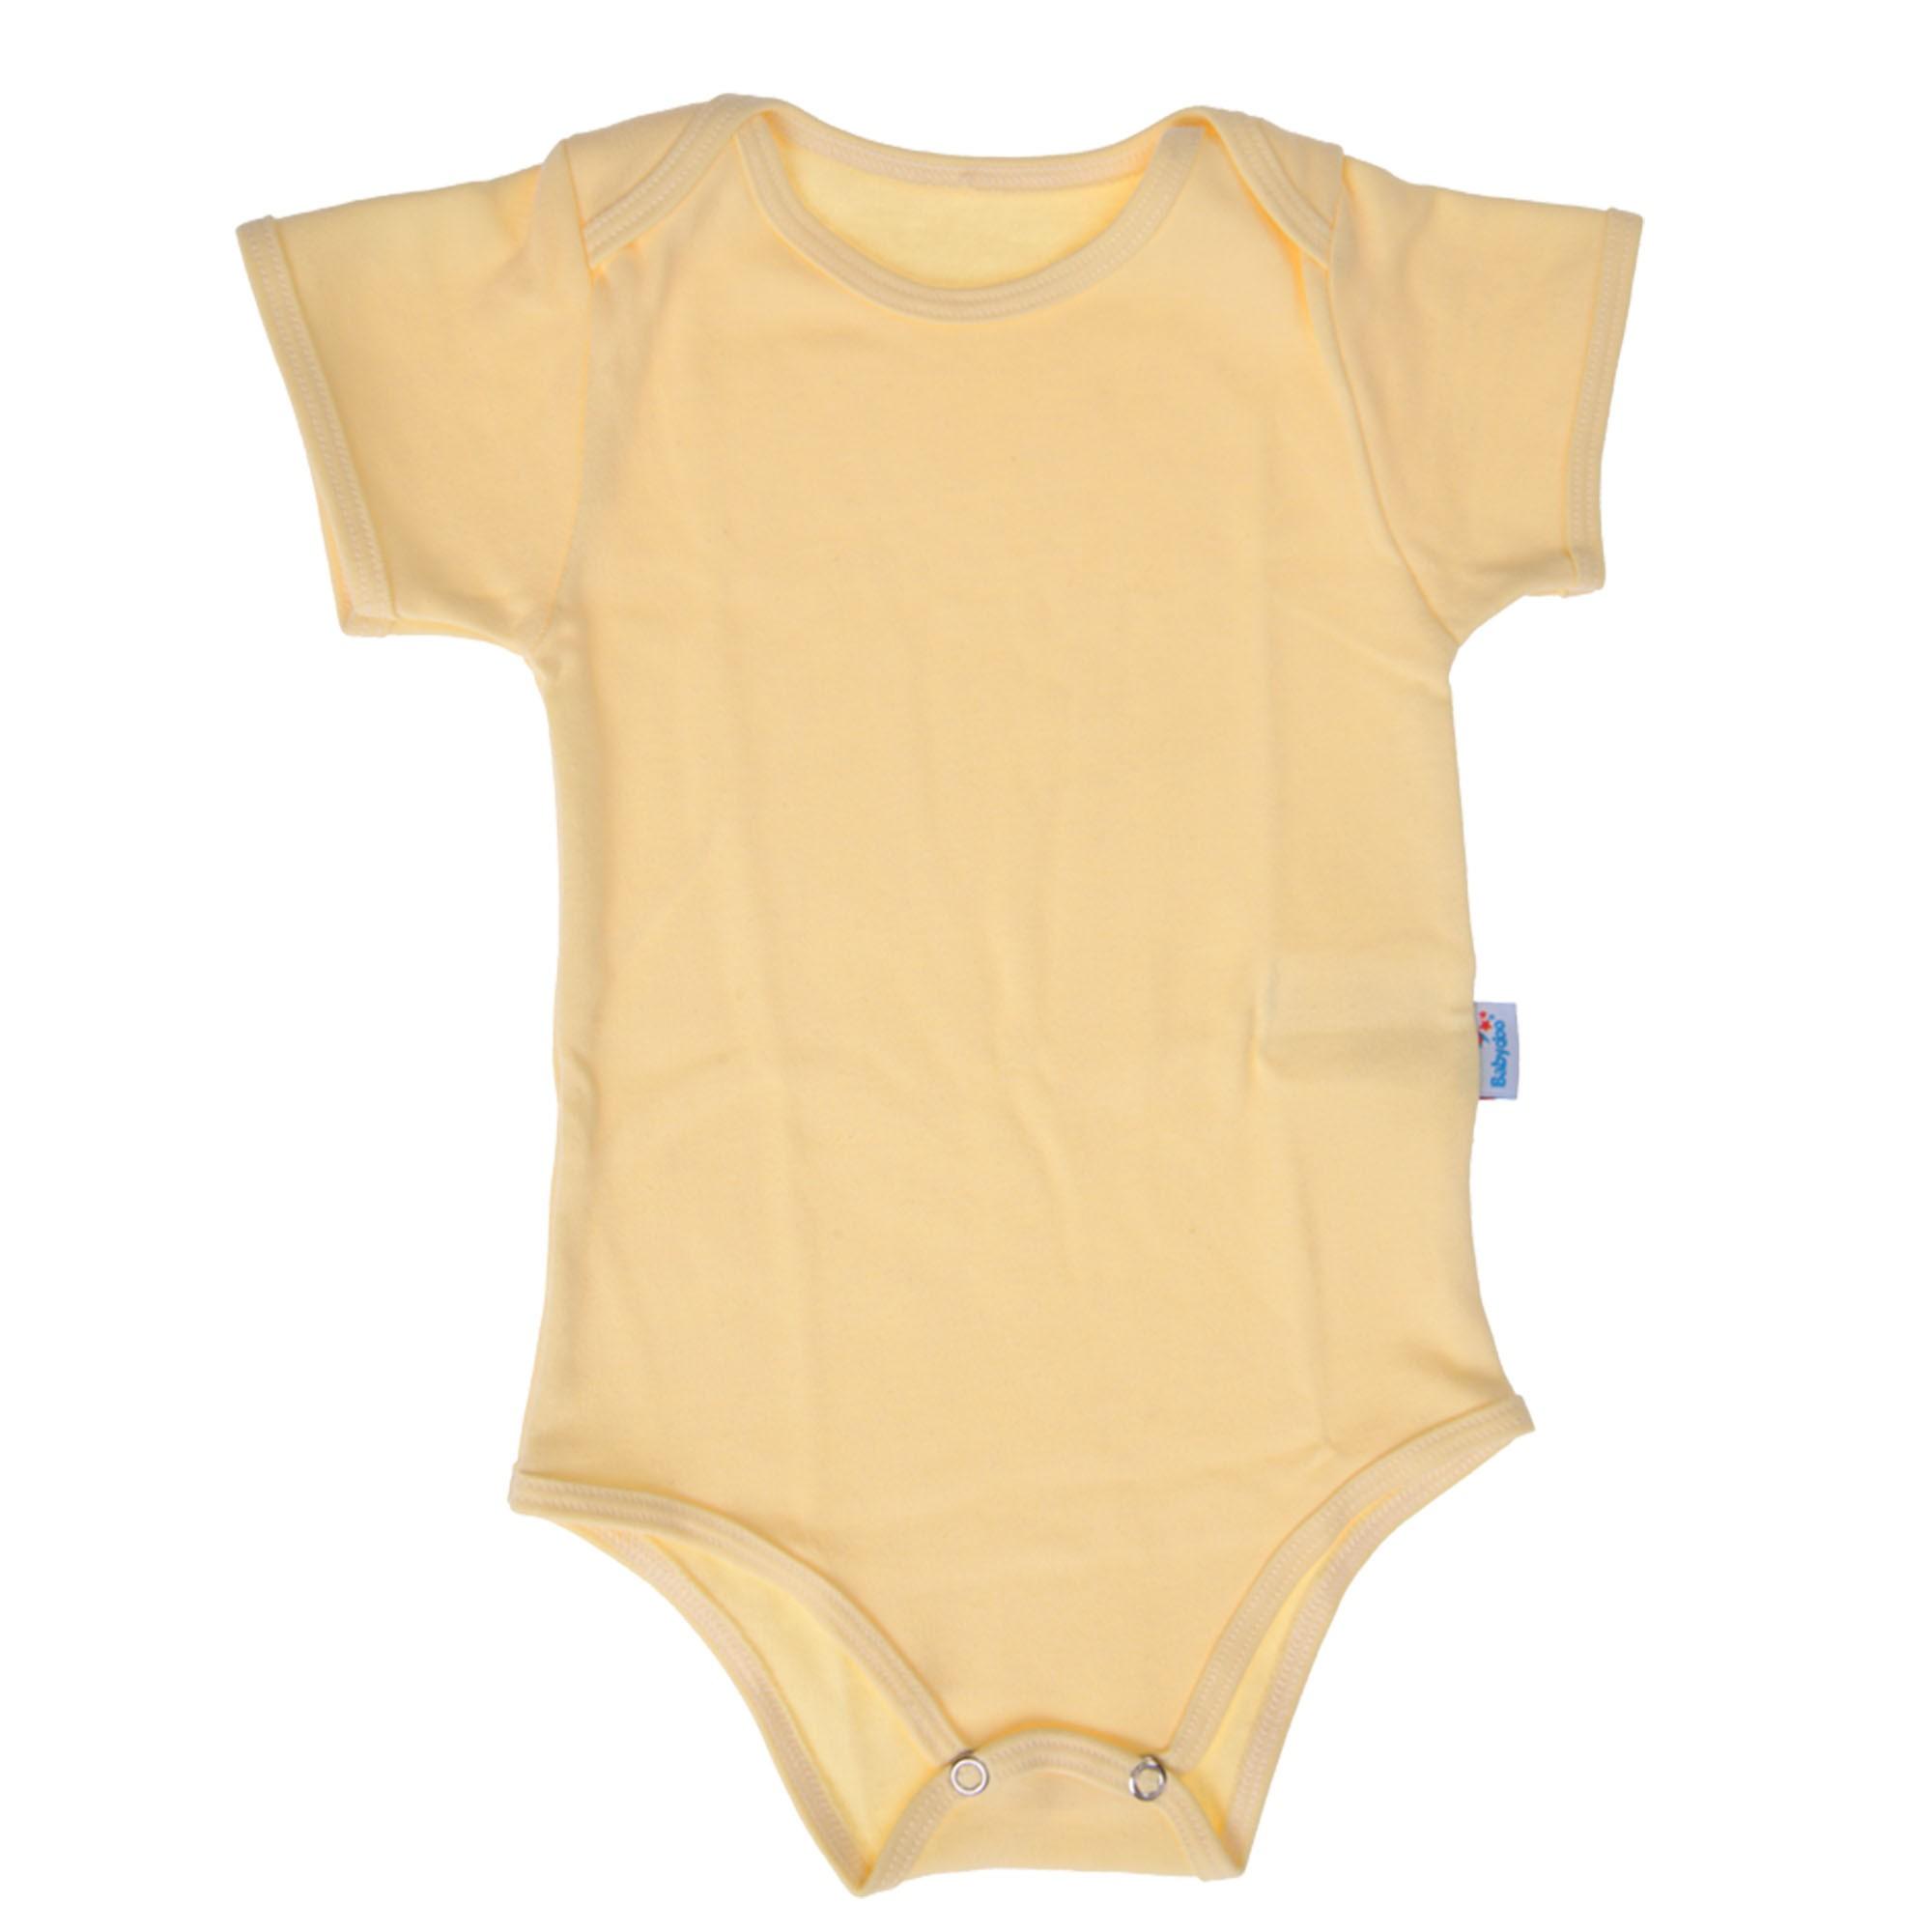 BODY MANGA CURTA BABY